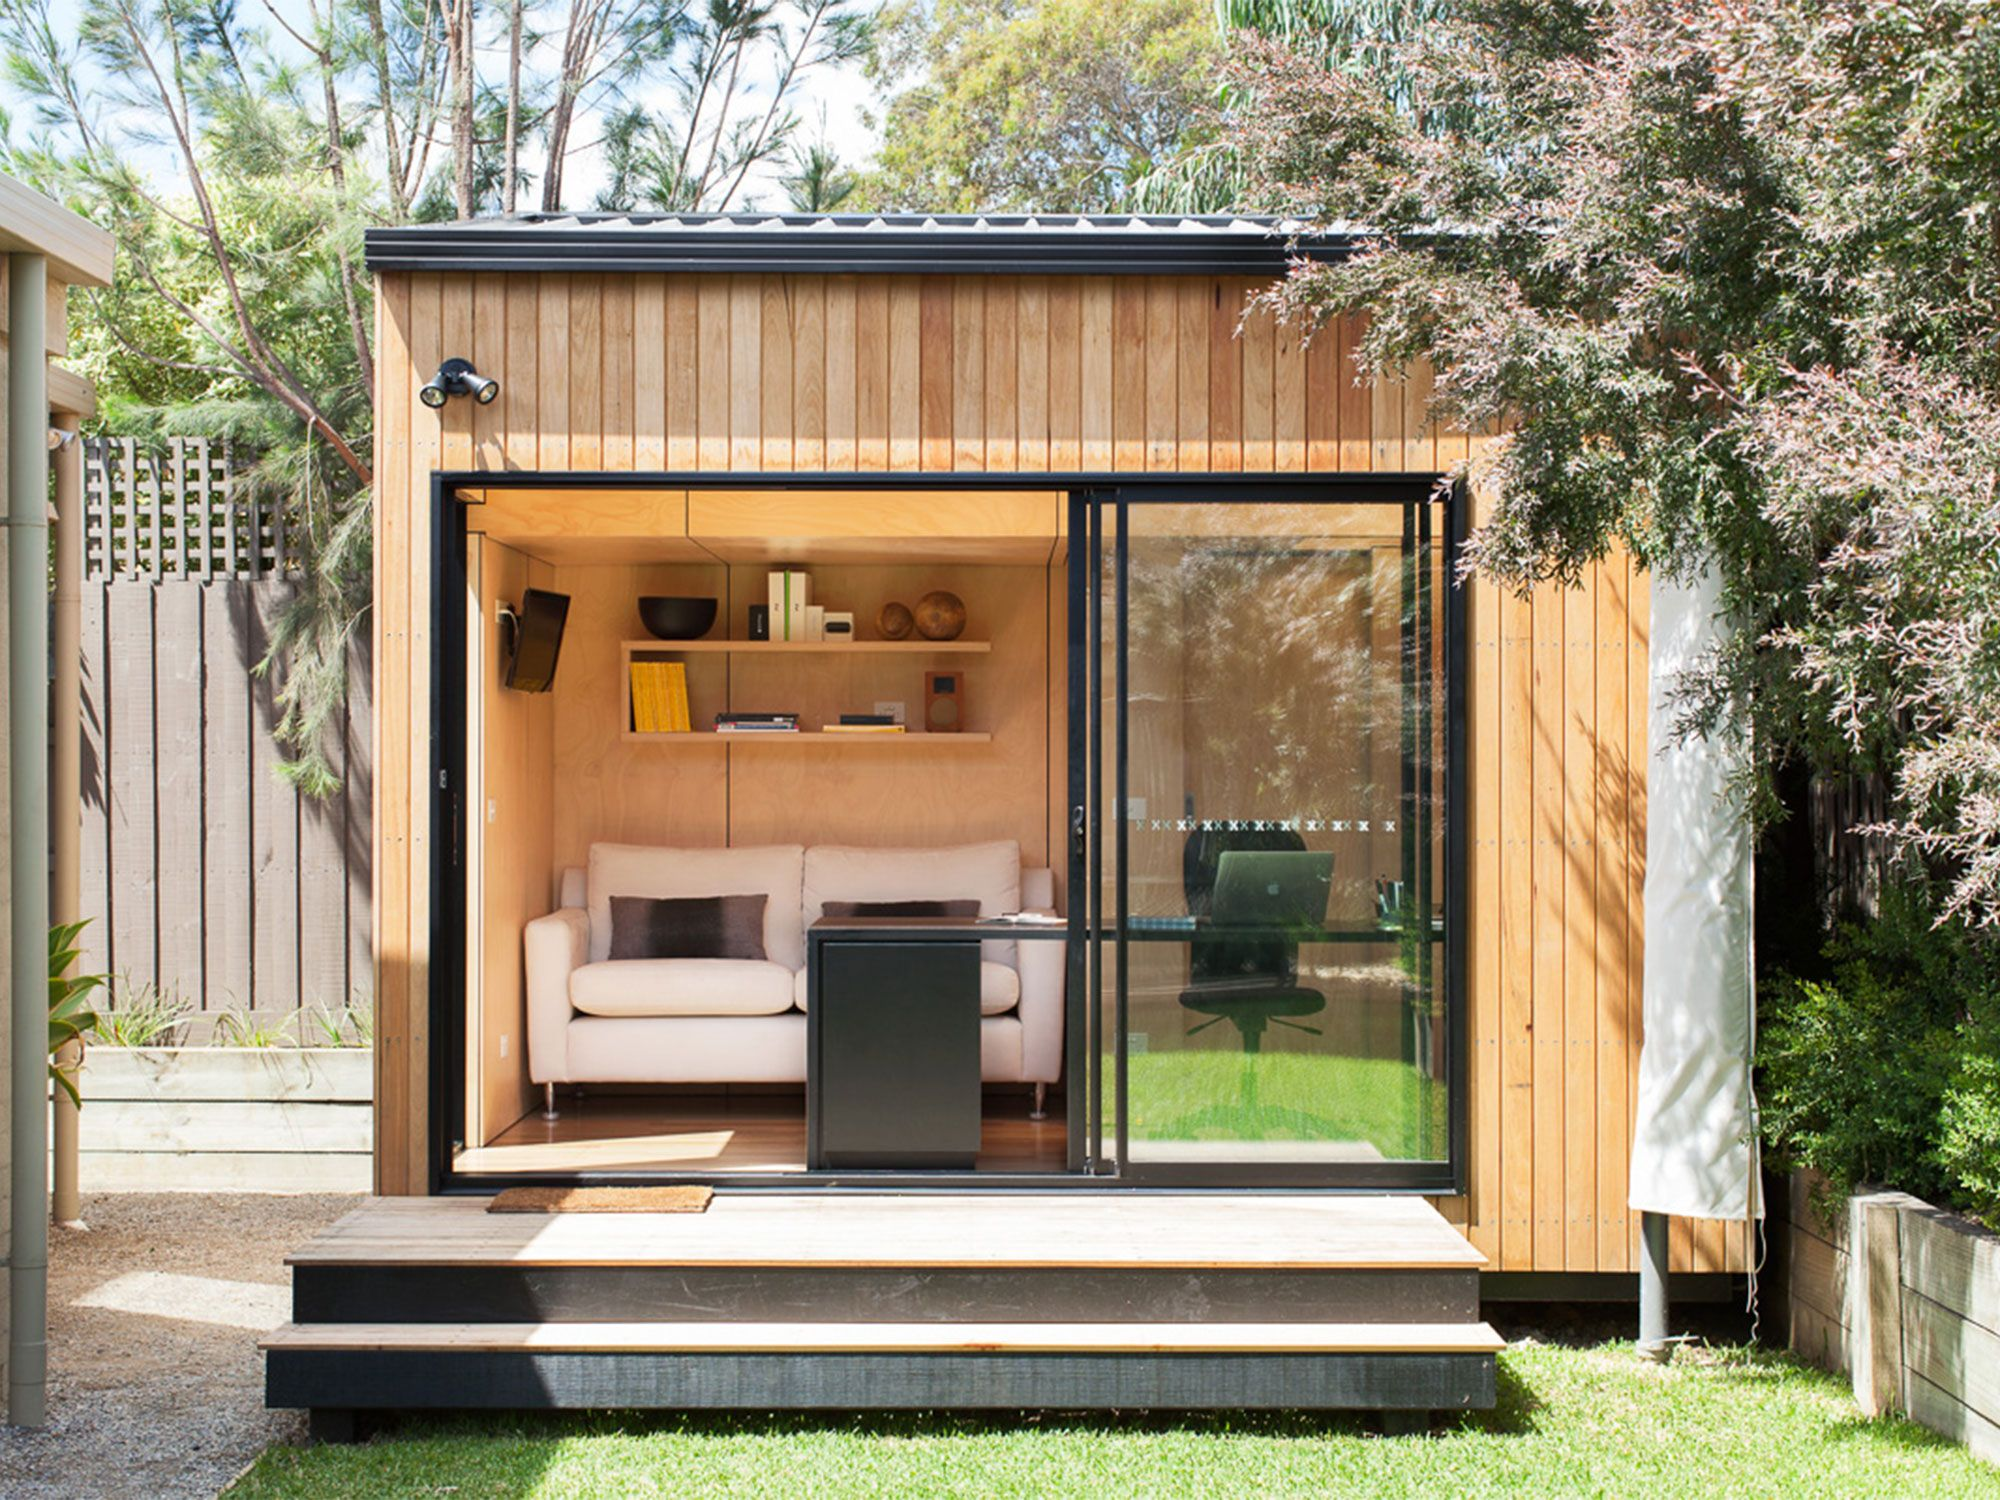 prefab prefabricated modular kit home studio | Prefab ...